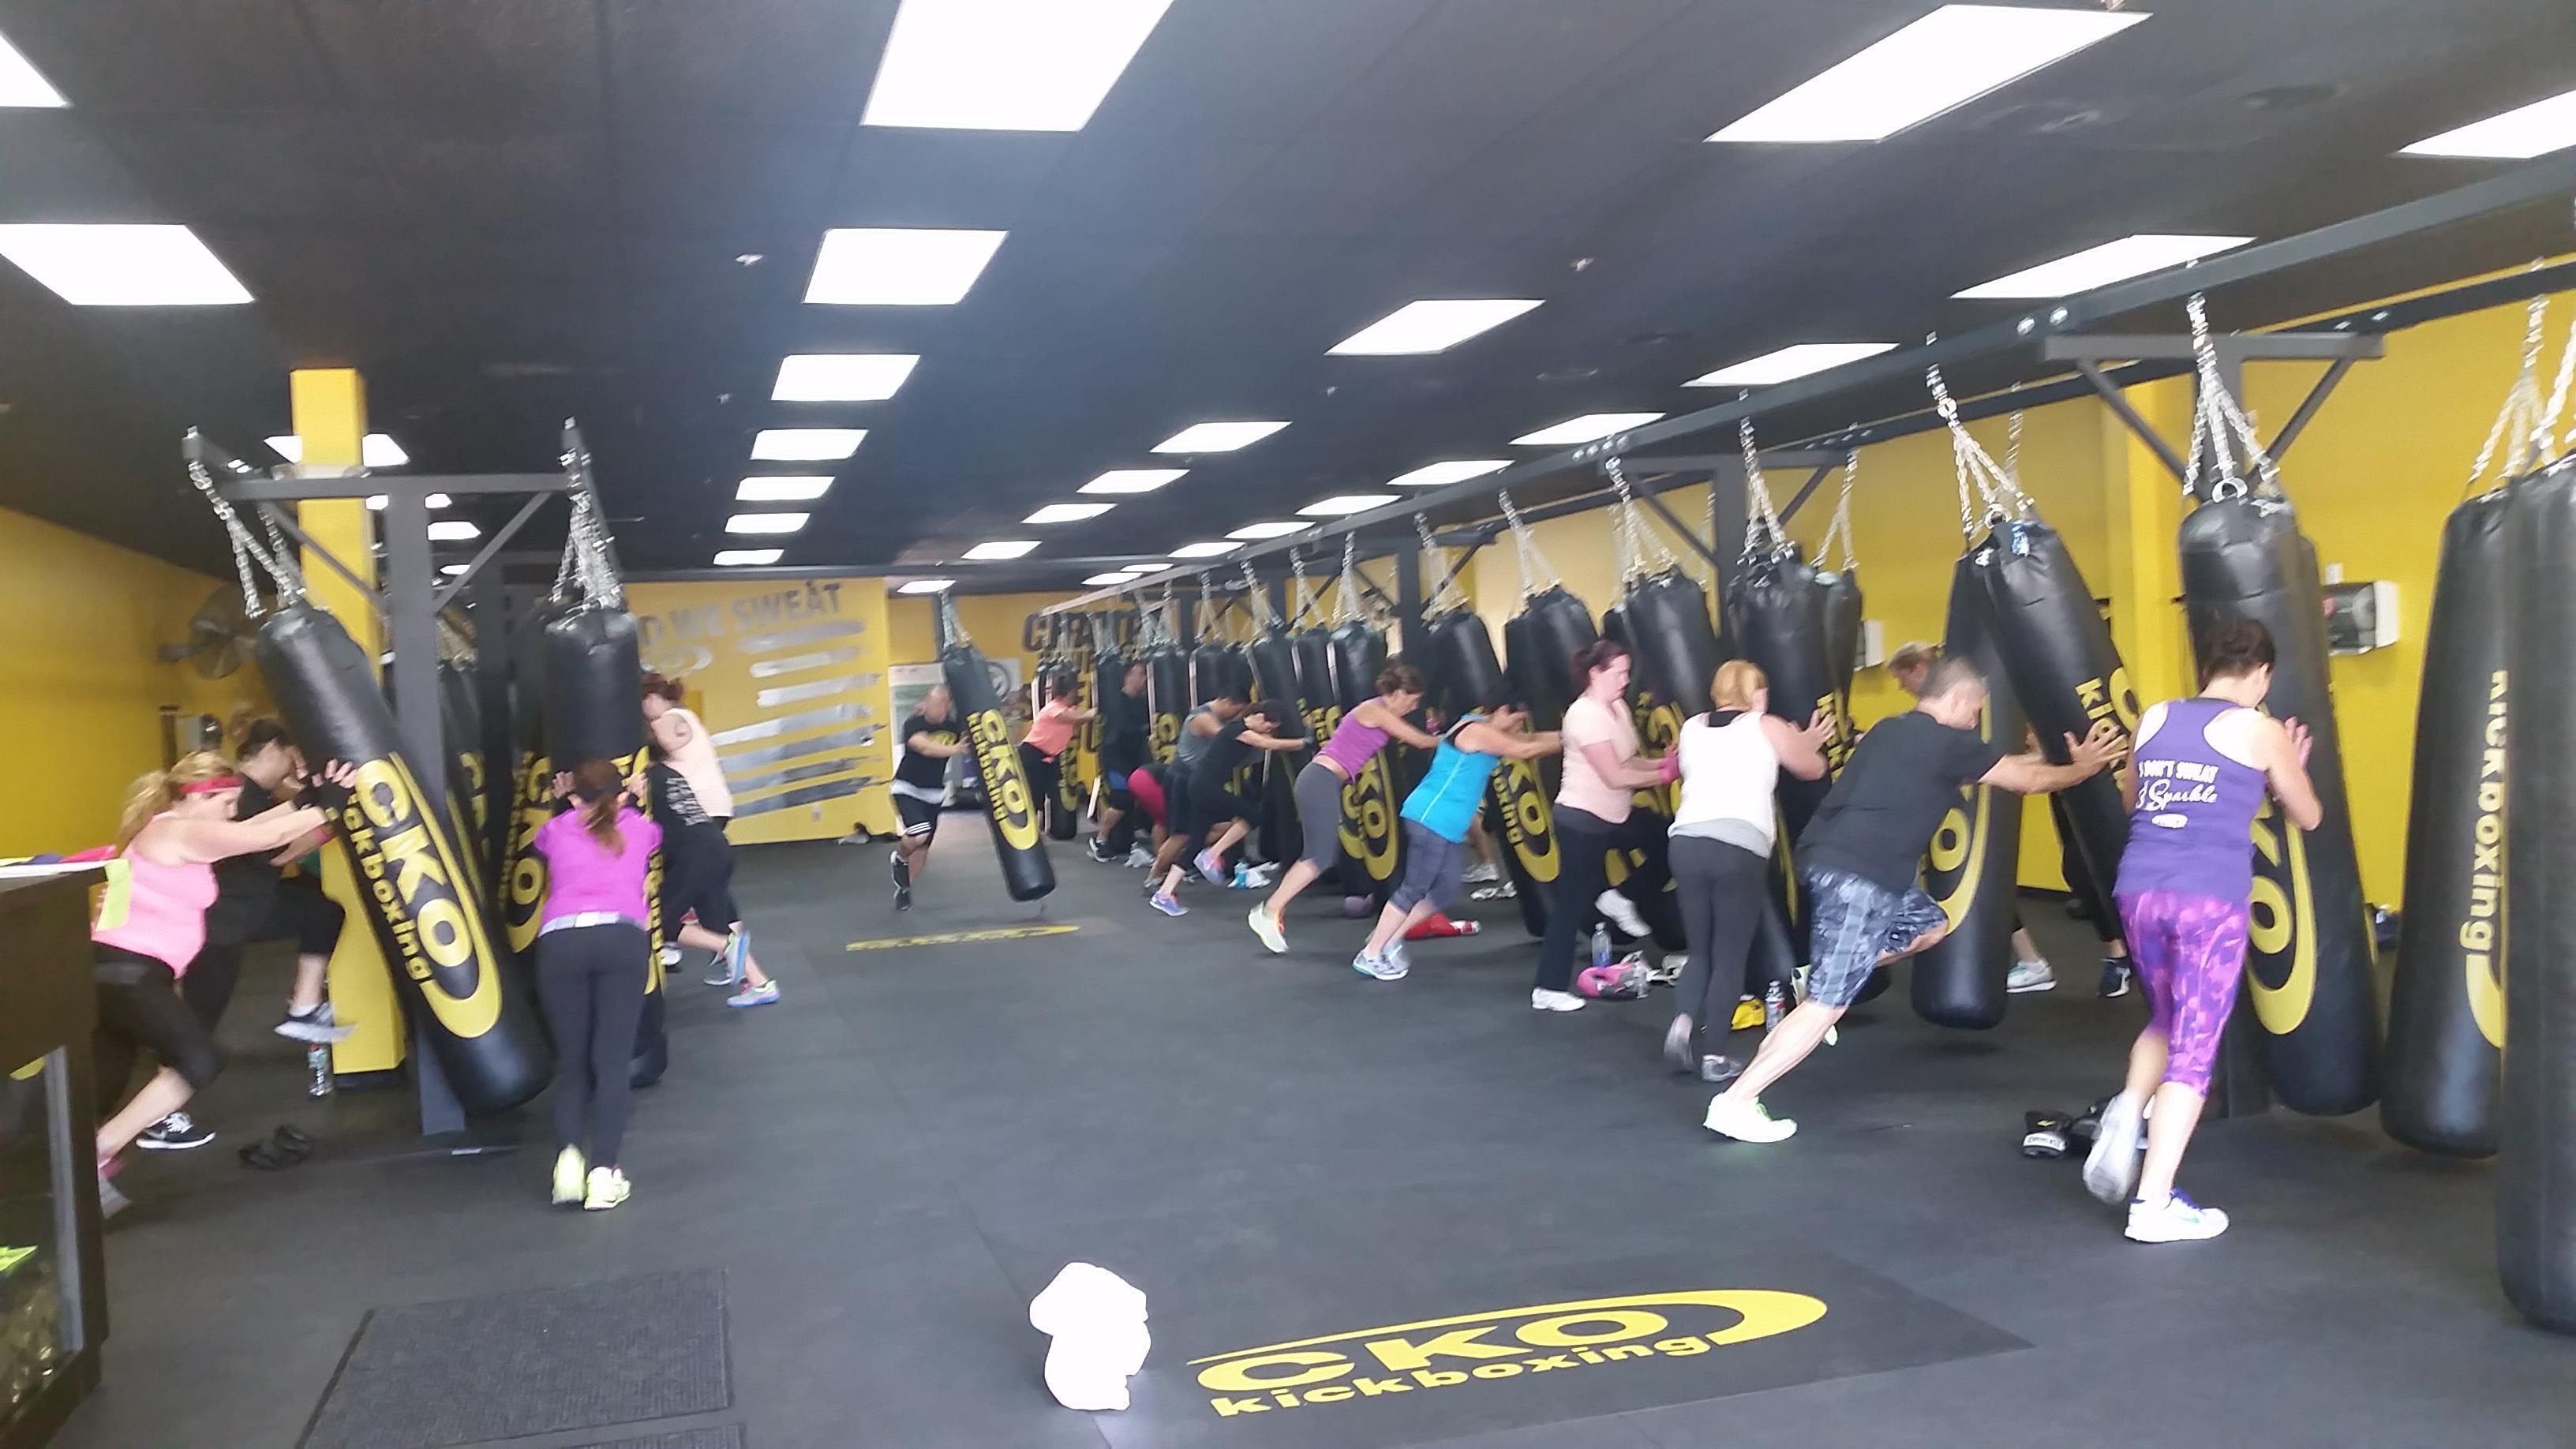 CKO Kickboxing of East Brunswick - ad image